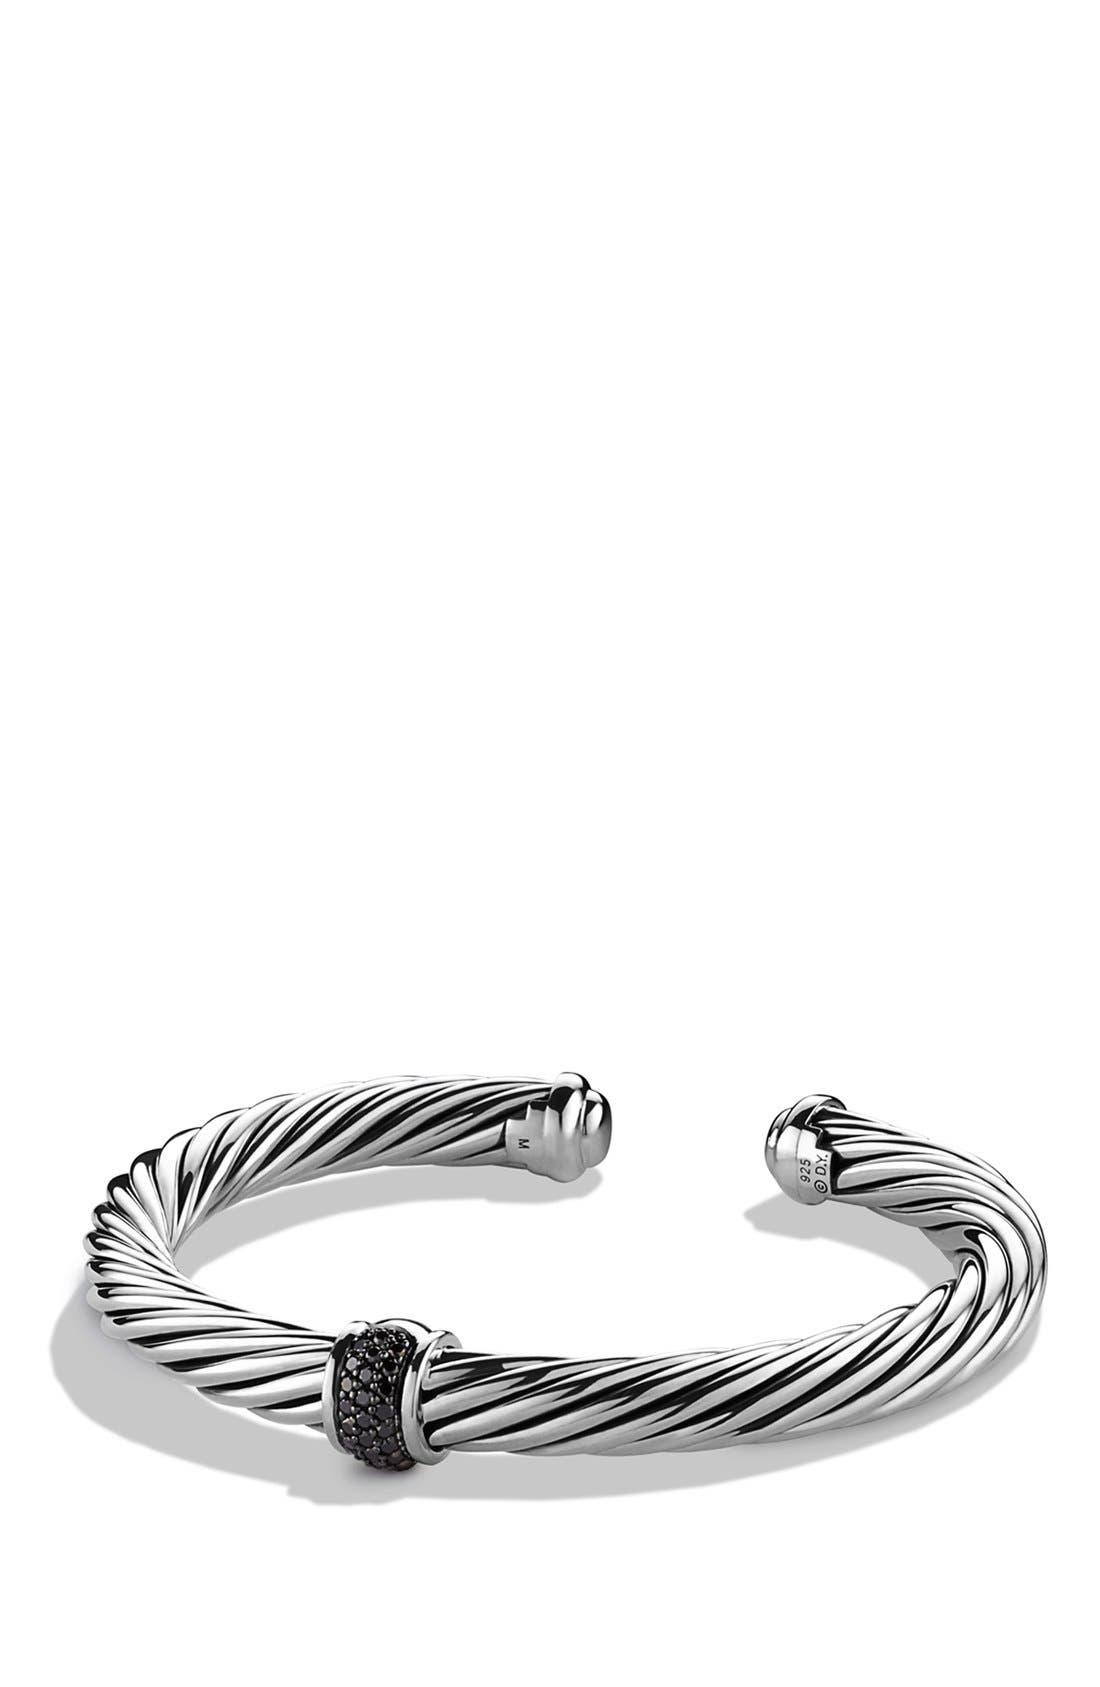 David Yurman 'Cable Classics' Bracelet with Black Diamonds